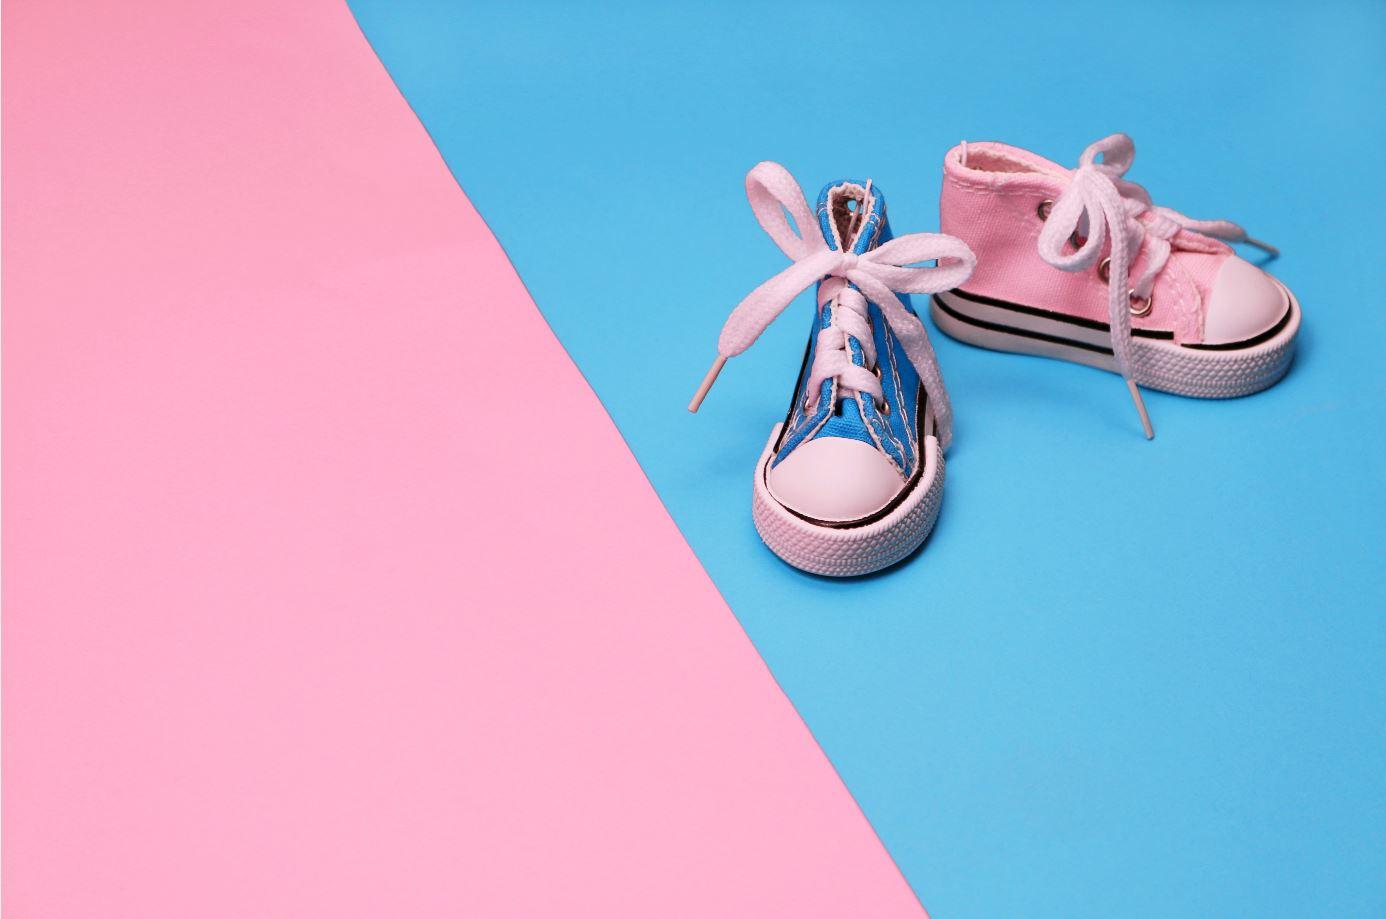 rosa und blau Schuhe